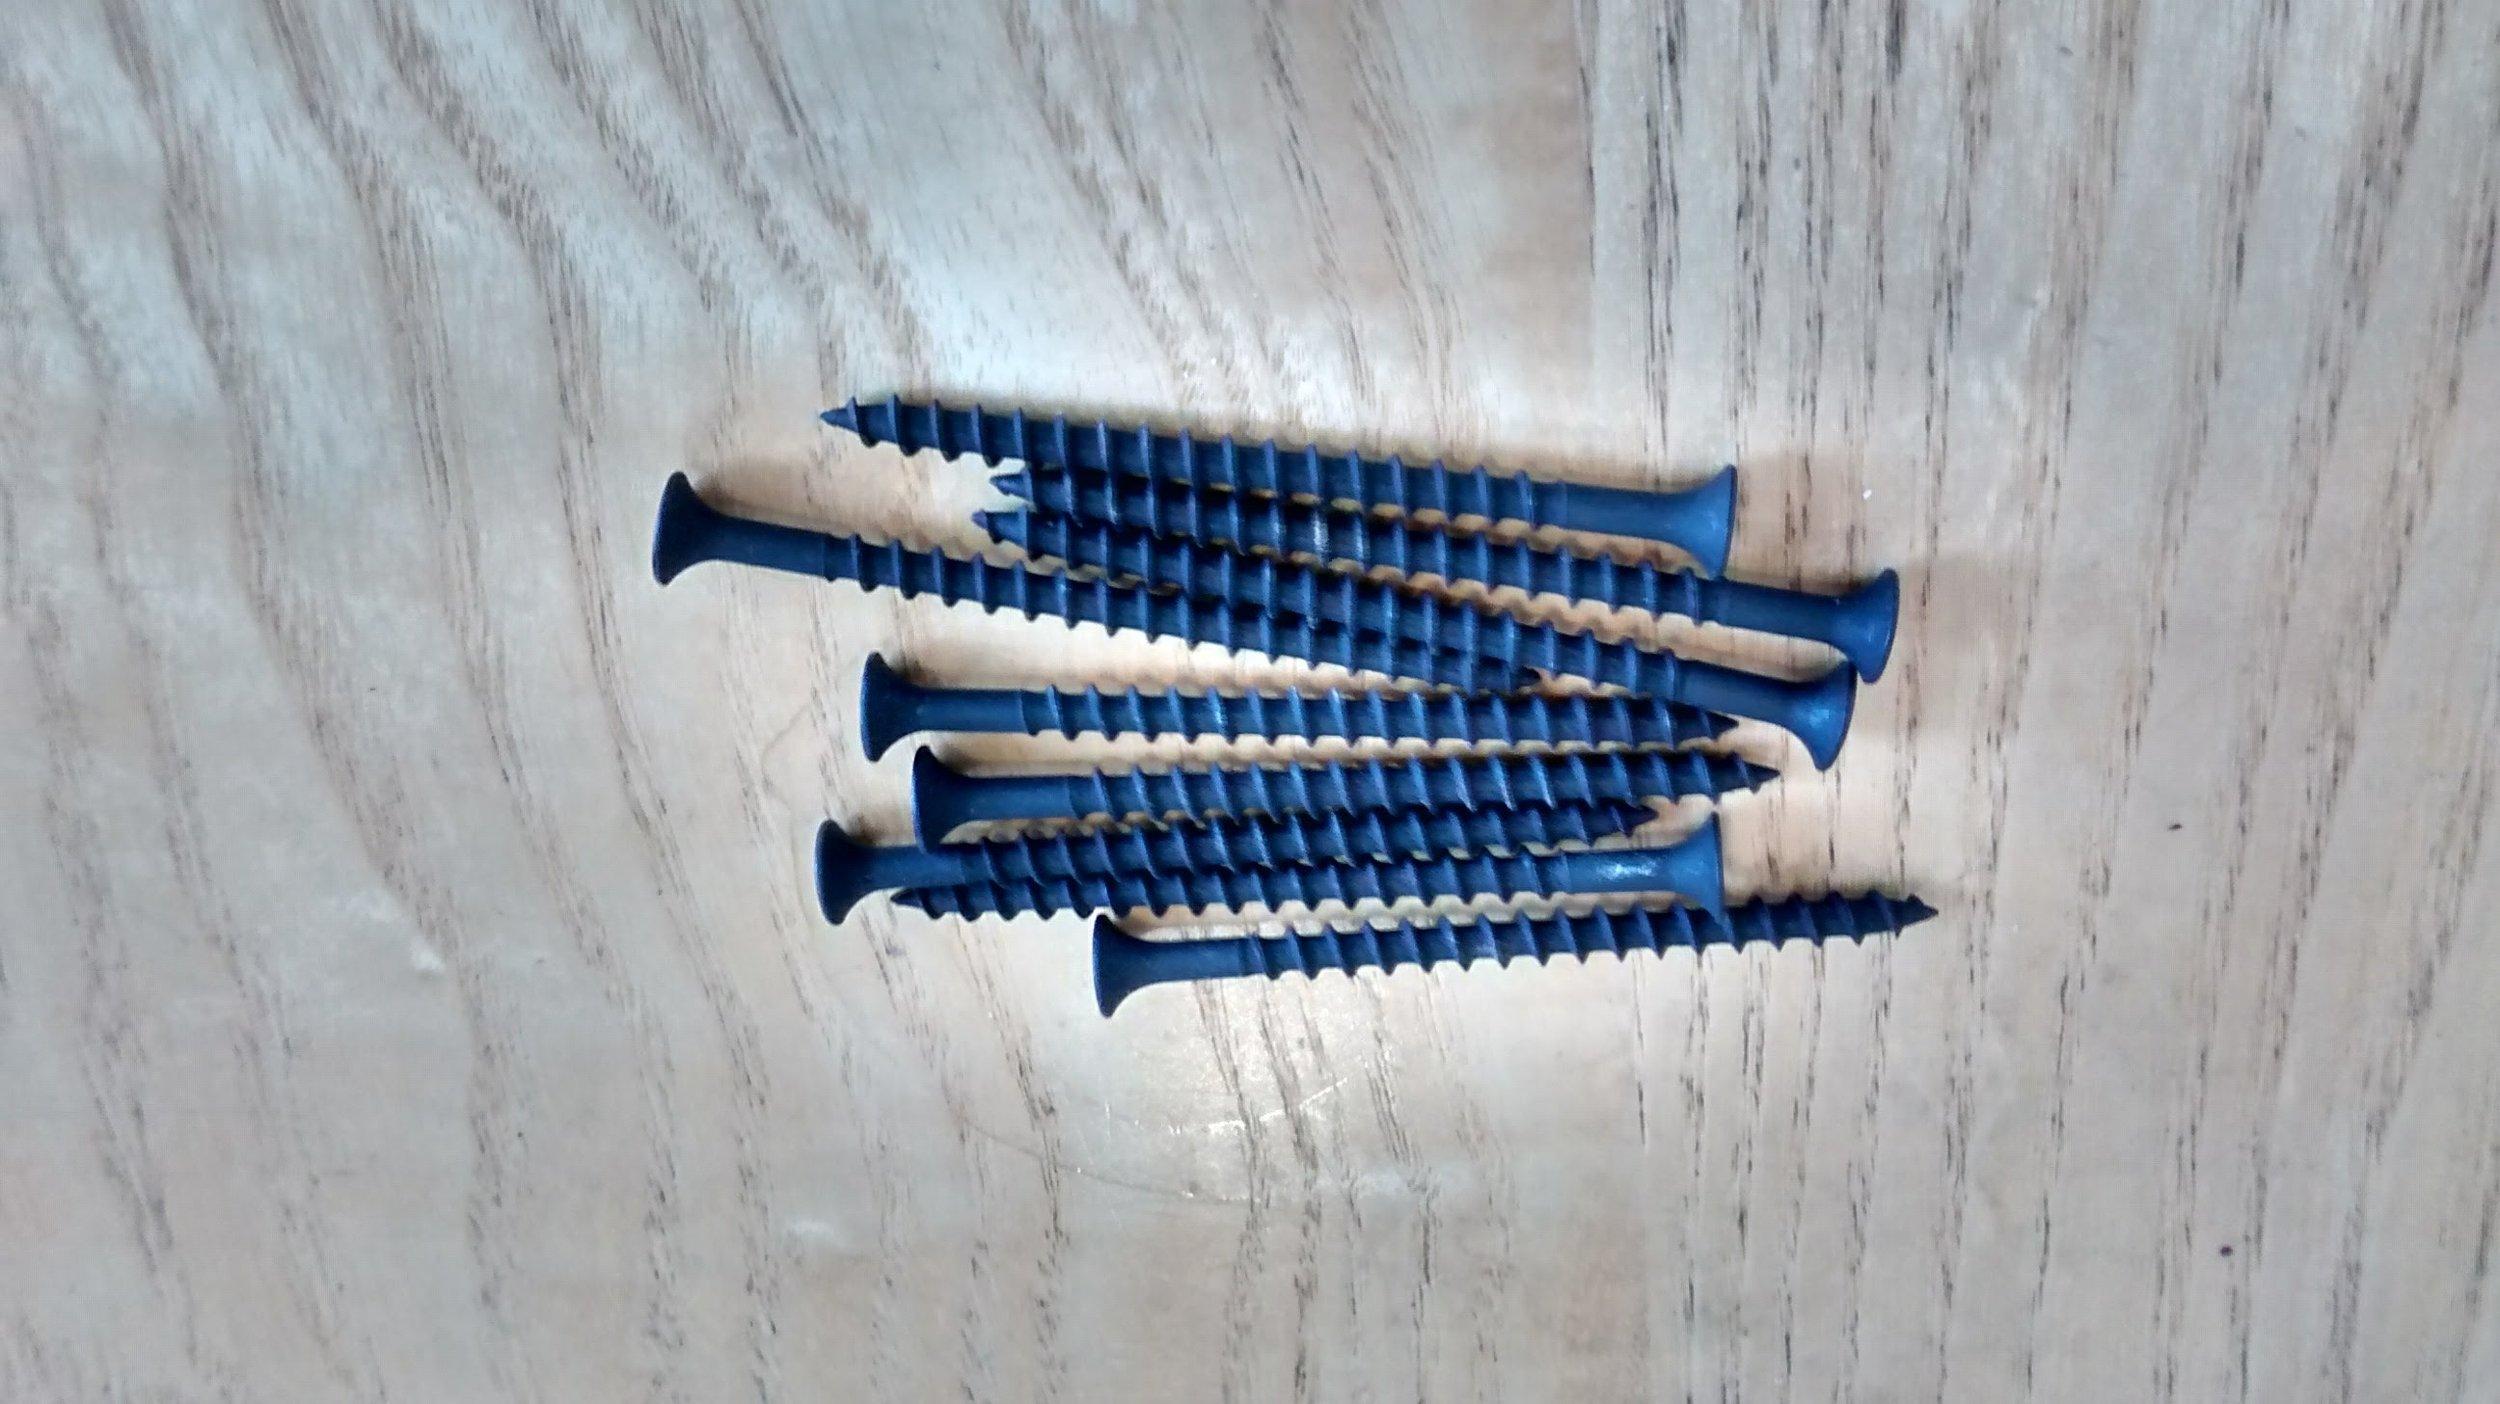 90 Long Wood Screws